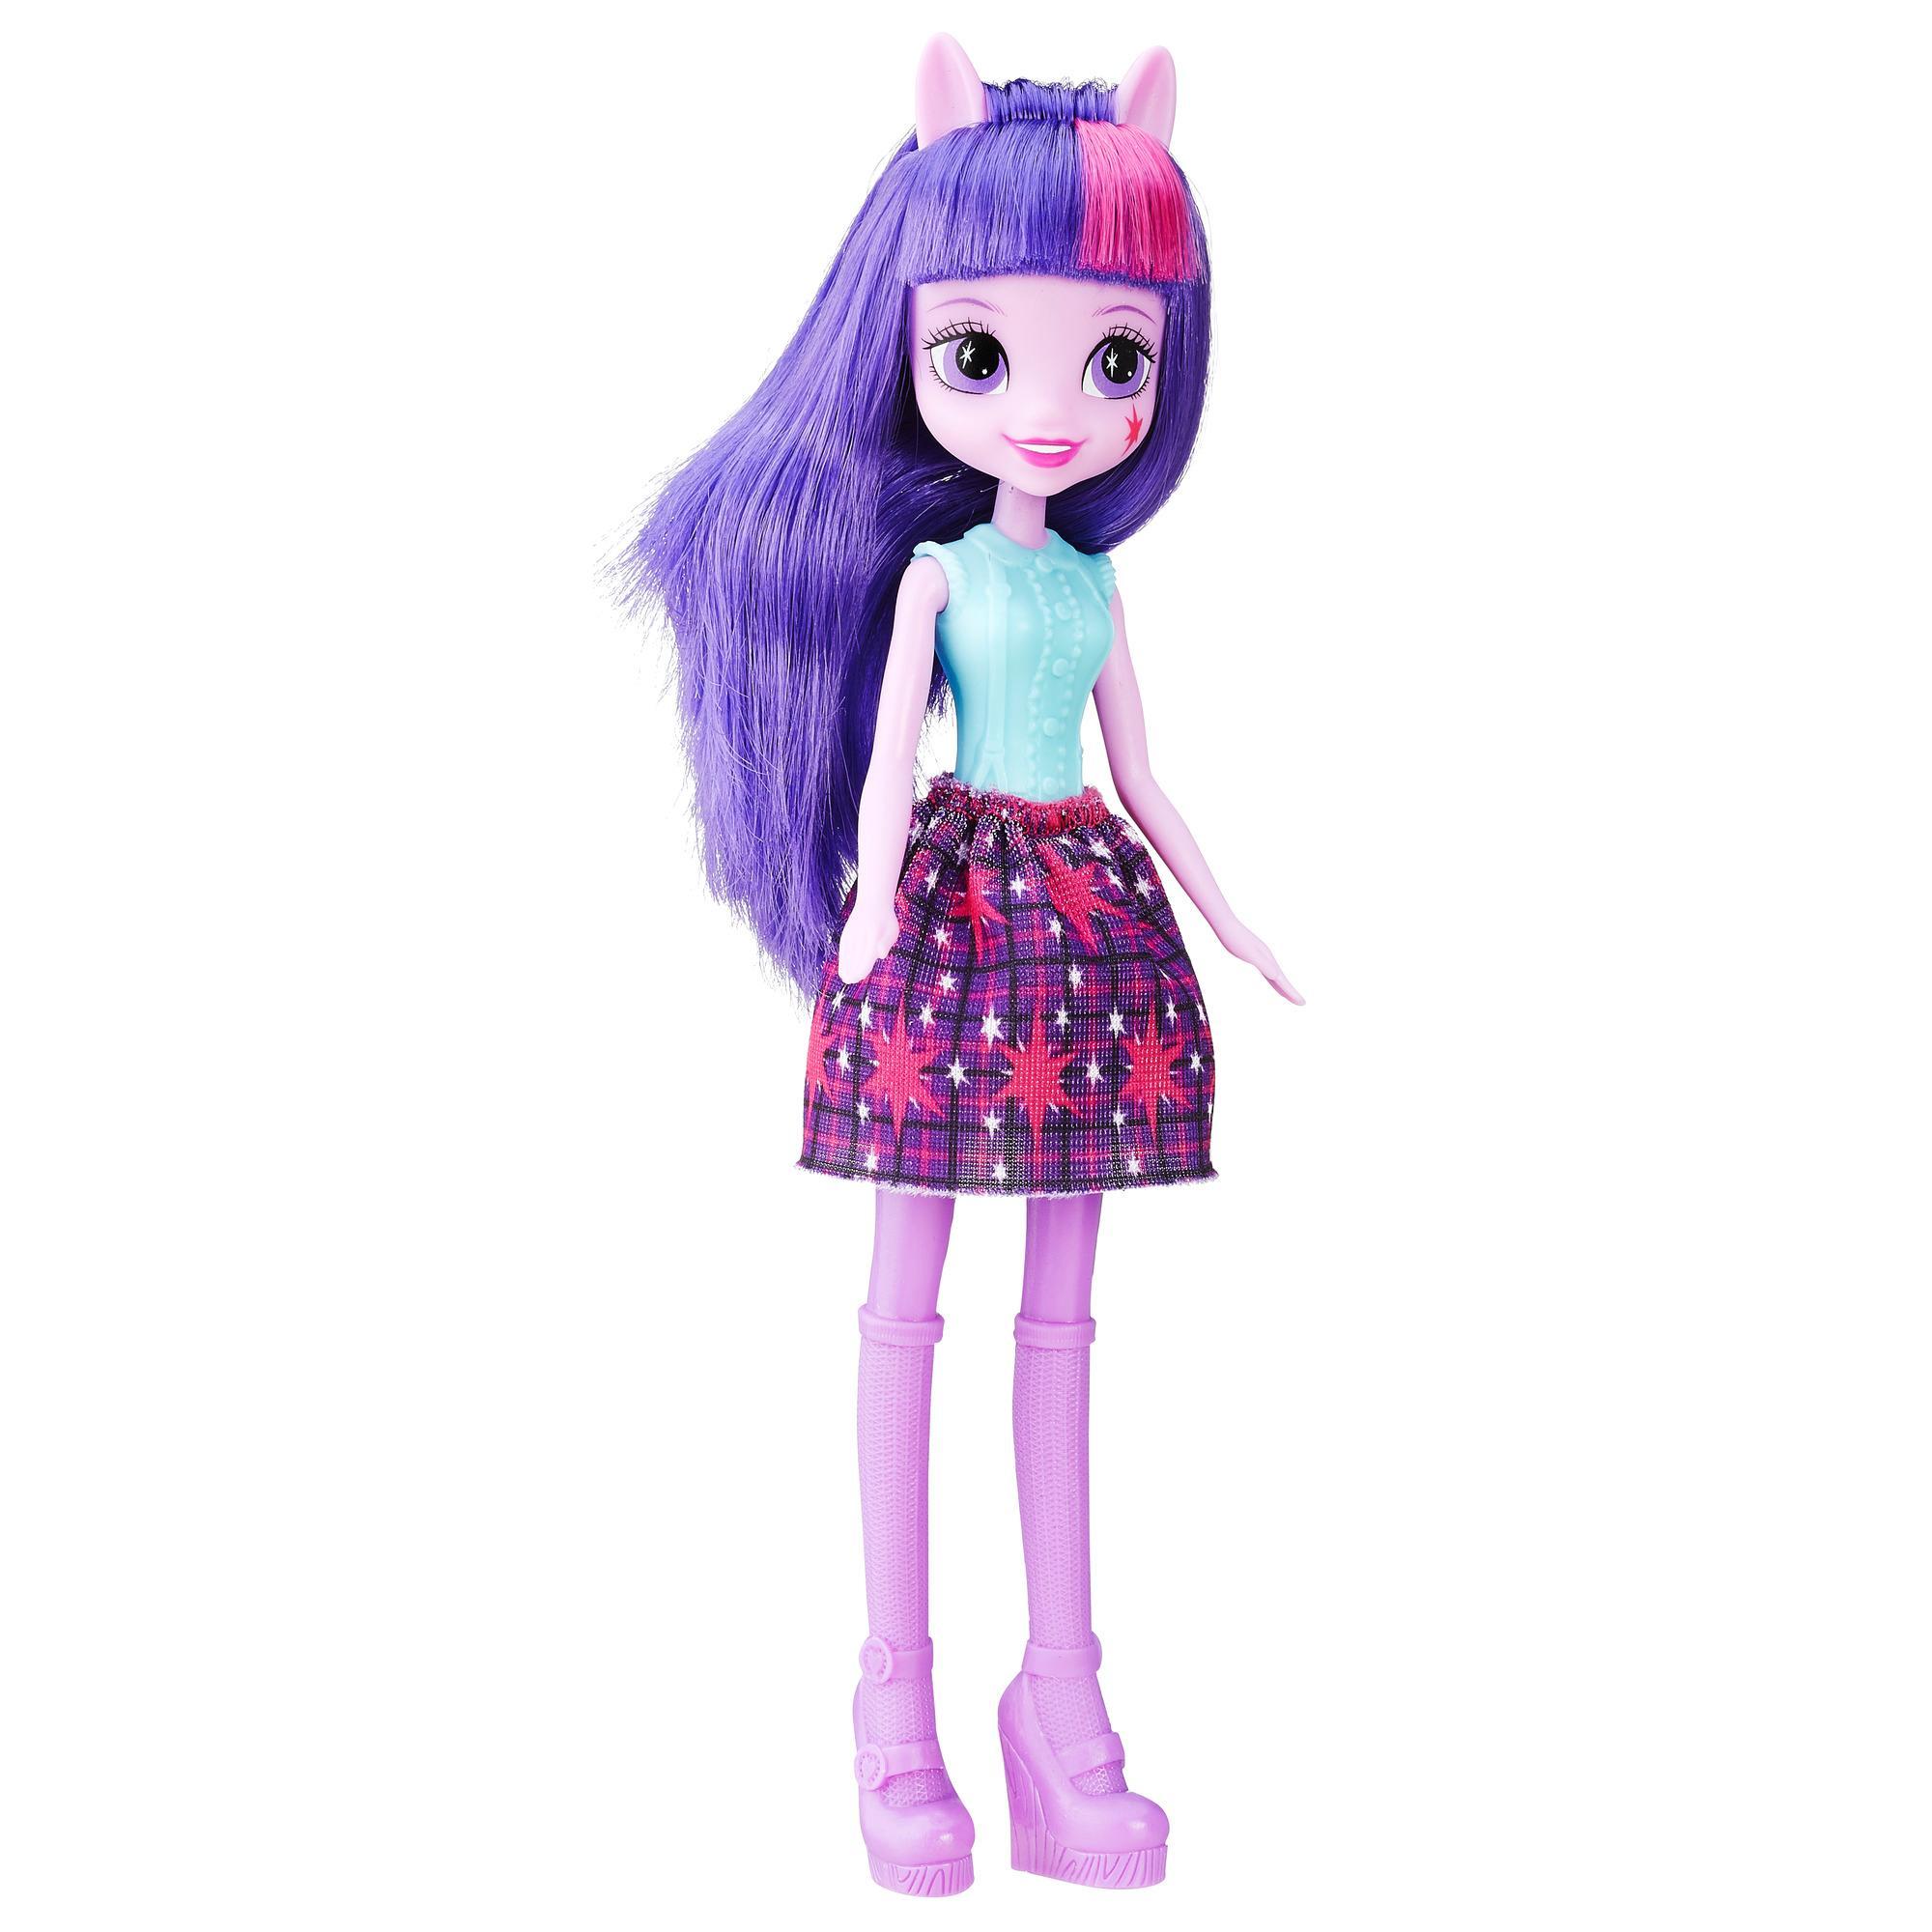 My Little Pony Equestria Girls Basic Doll Assortment